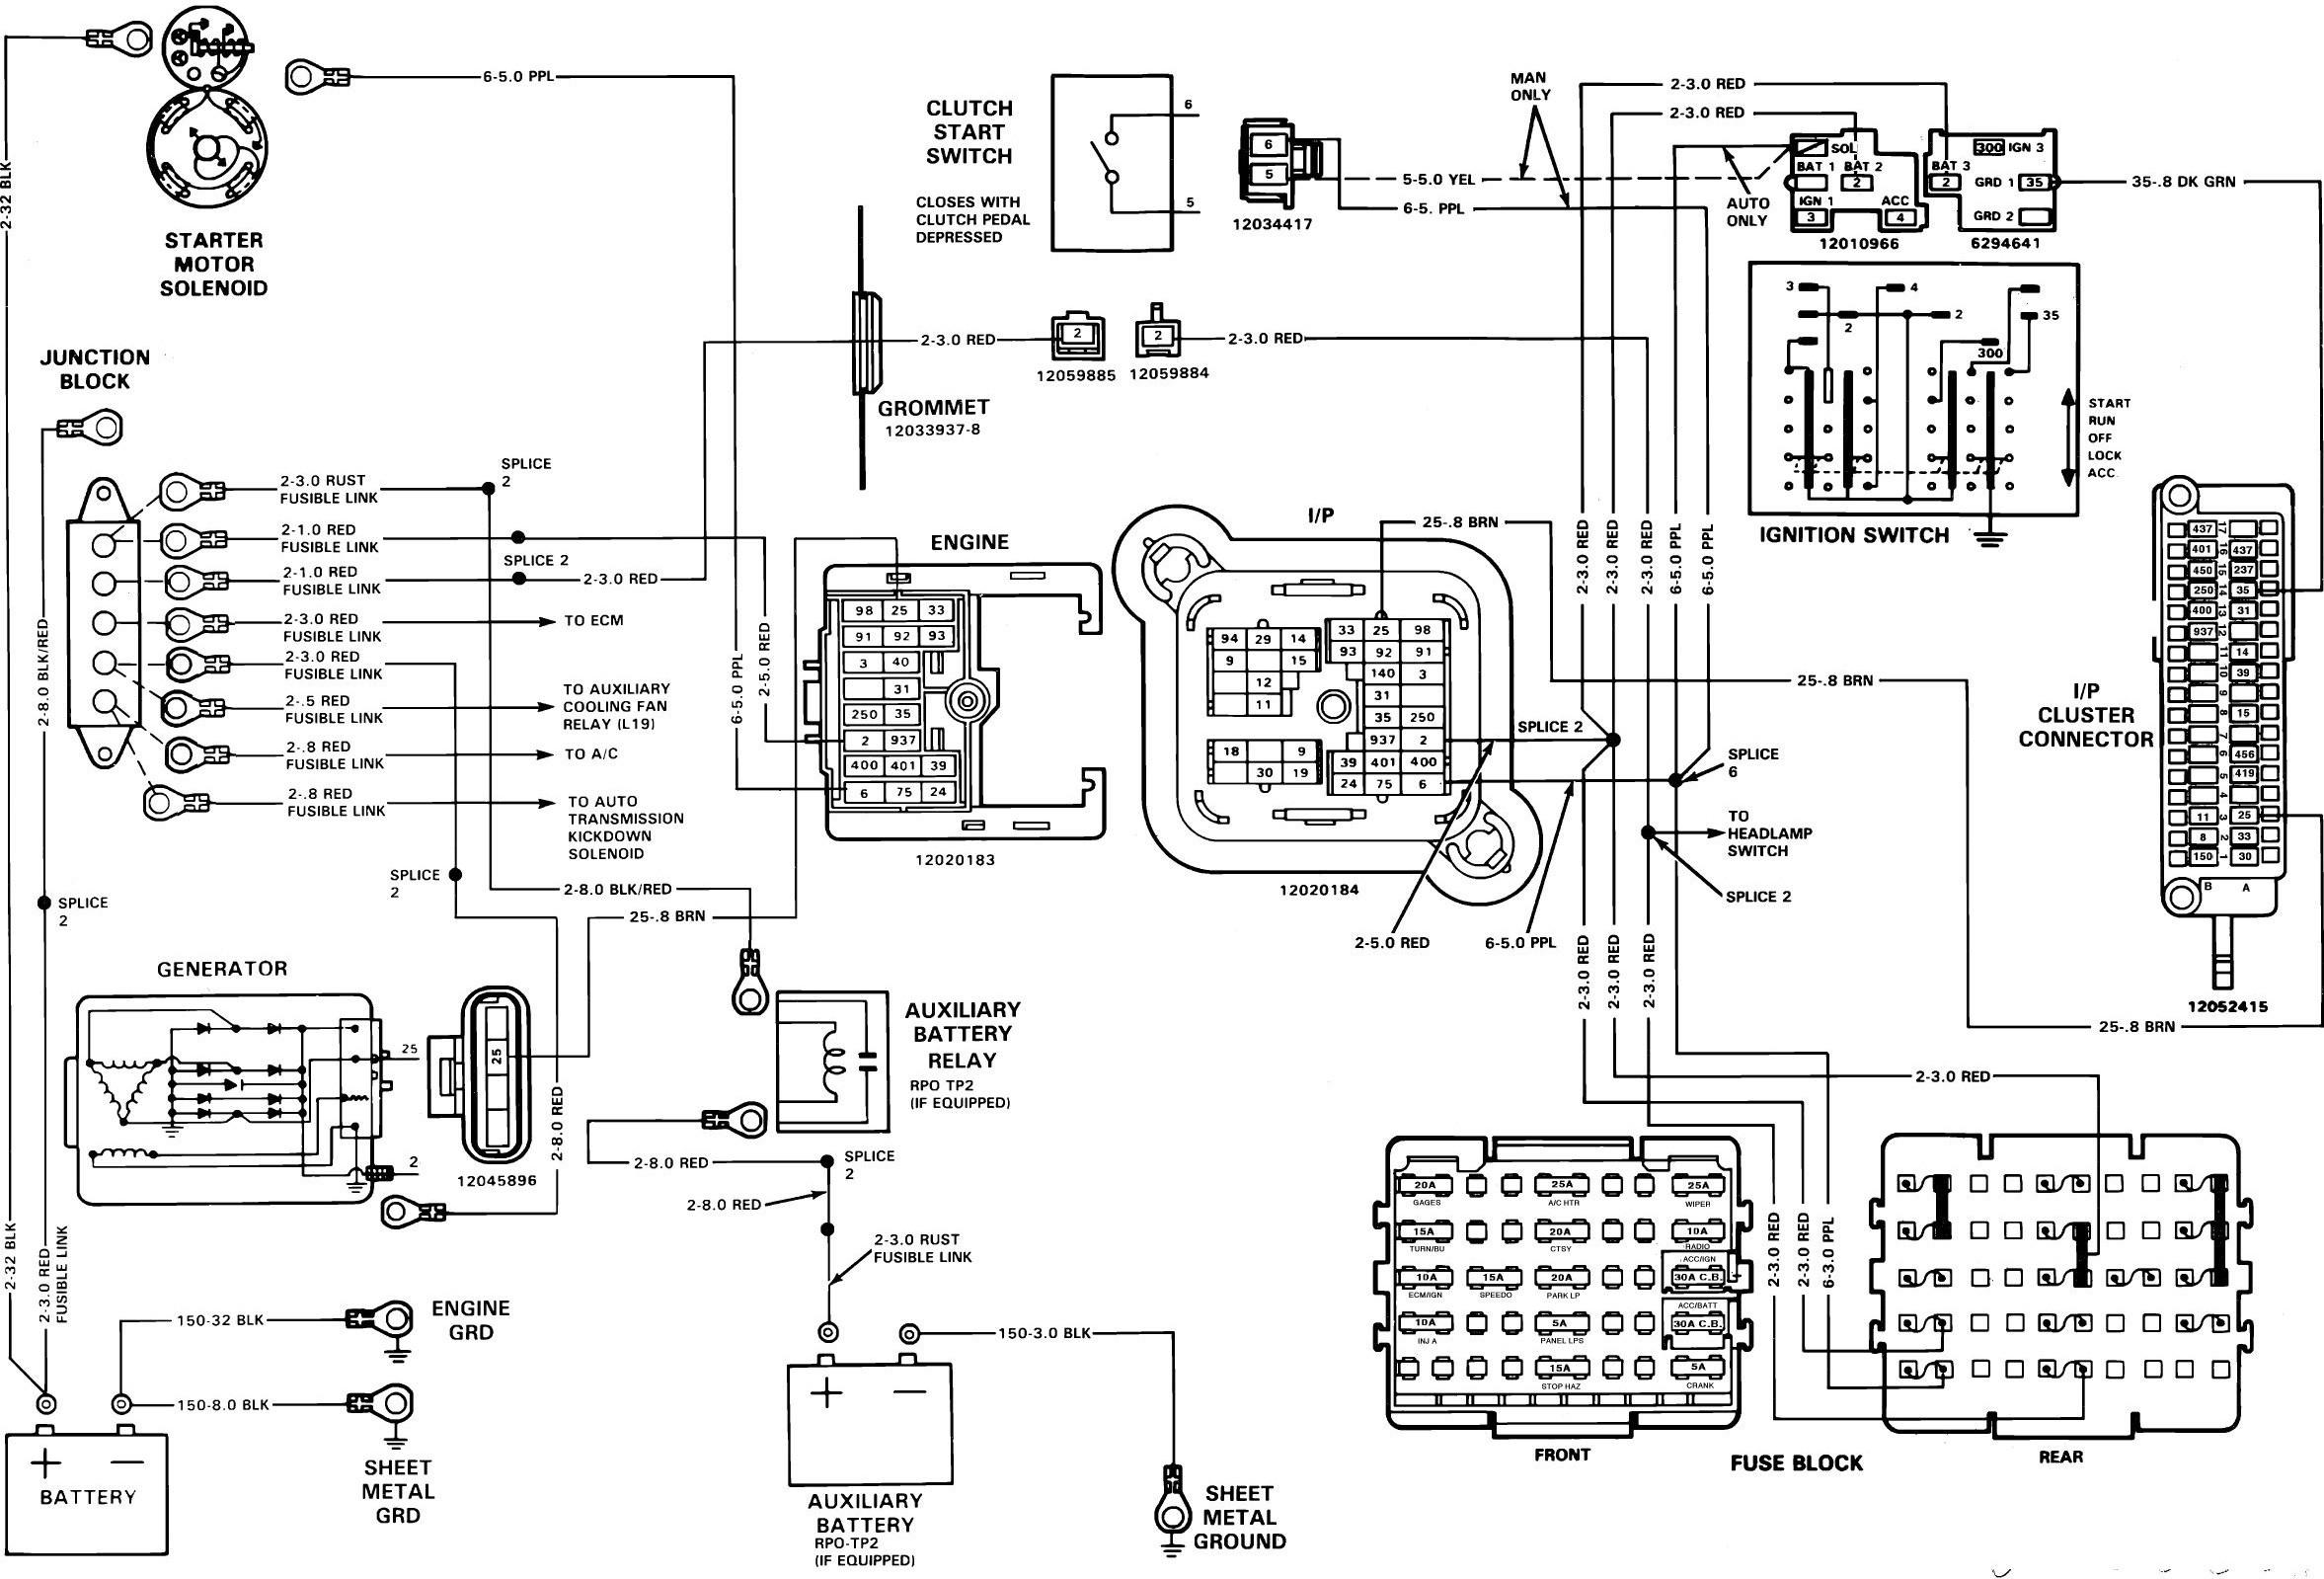 Silverado Wiring Diagram My Wiring Diagram